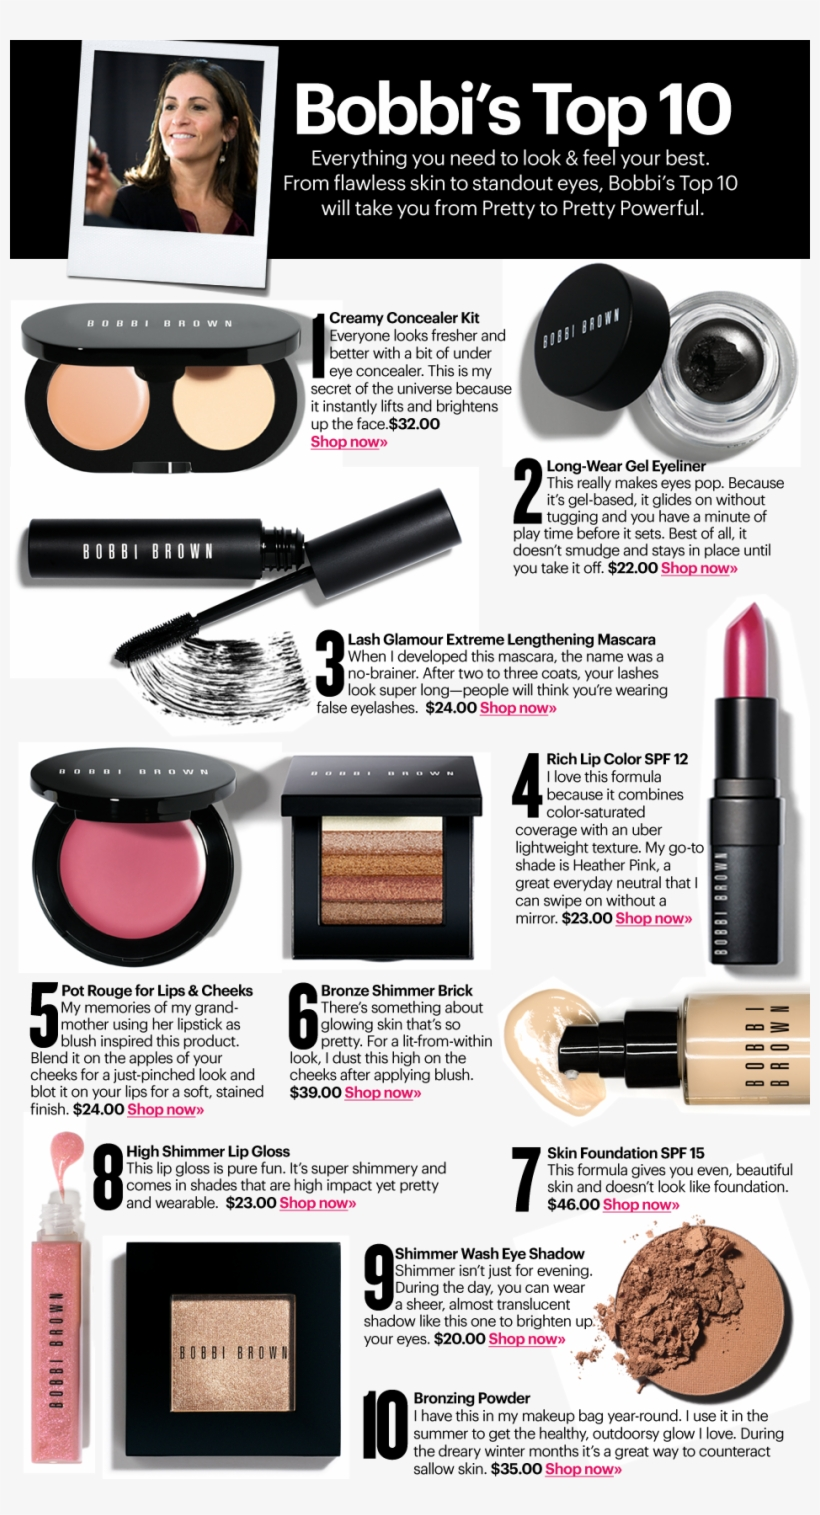 #office #looks #makeup #bobbibrown #top10 #concealer - Bobbi Brown Top Product, transparent png #4237227